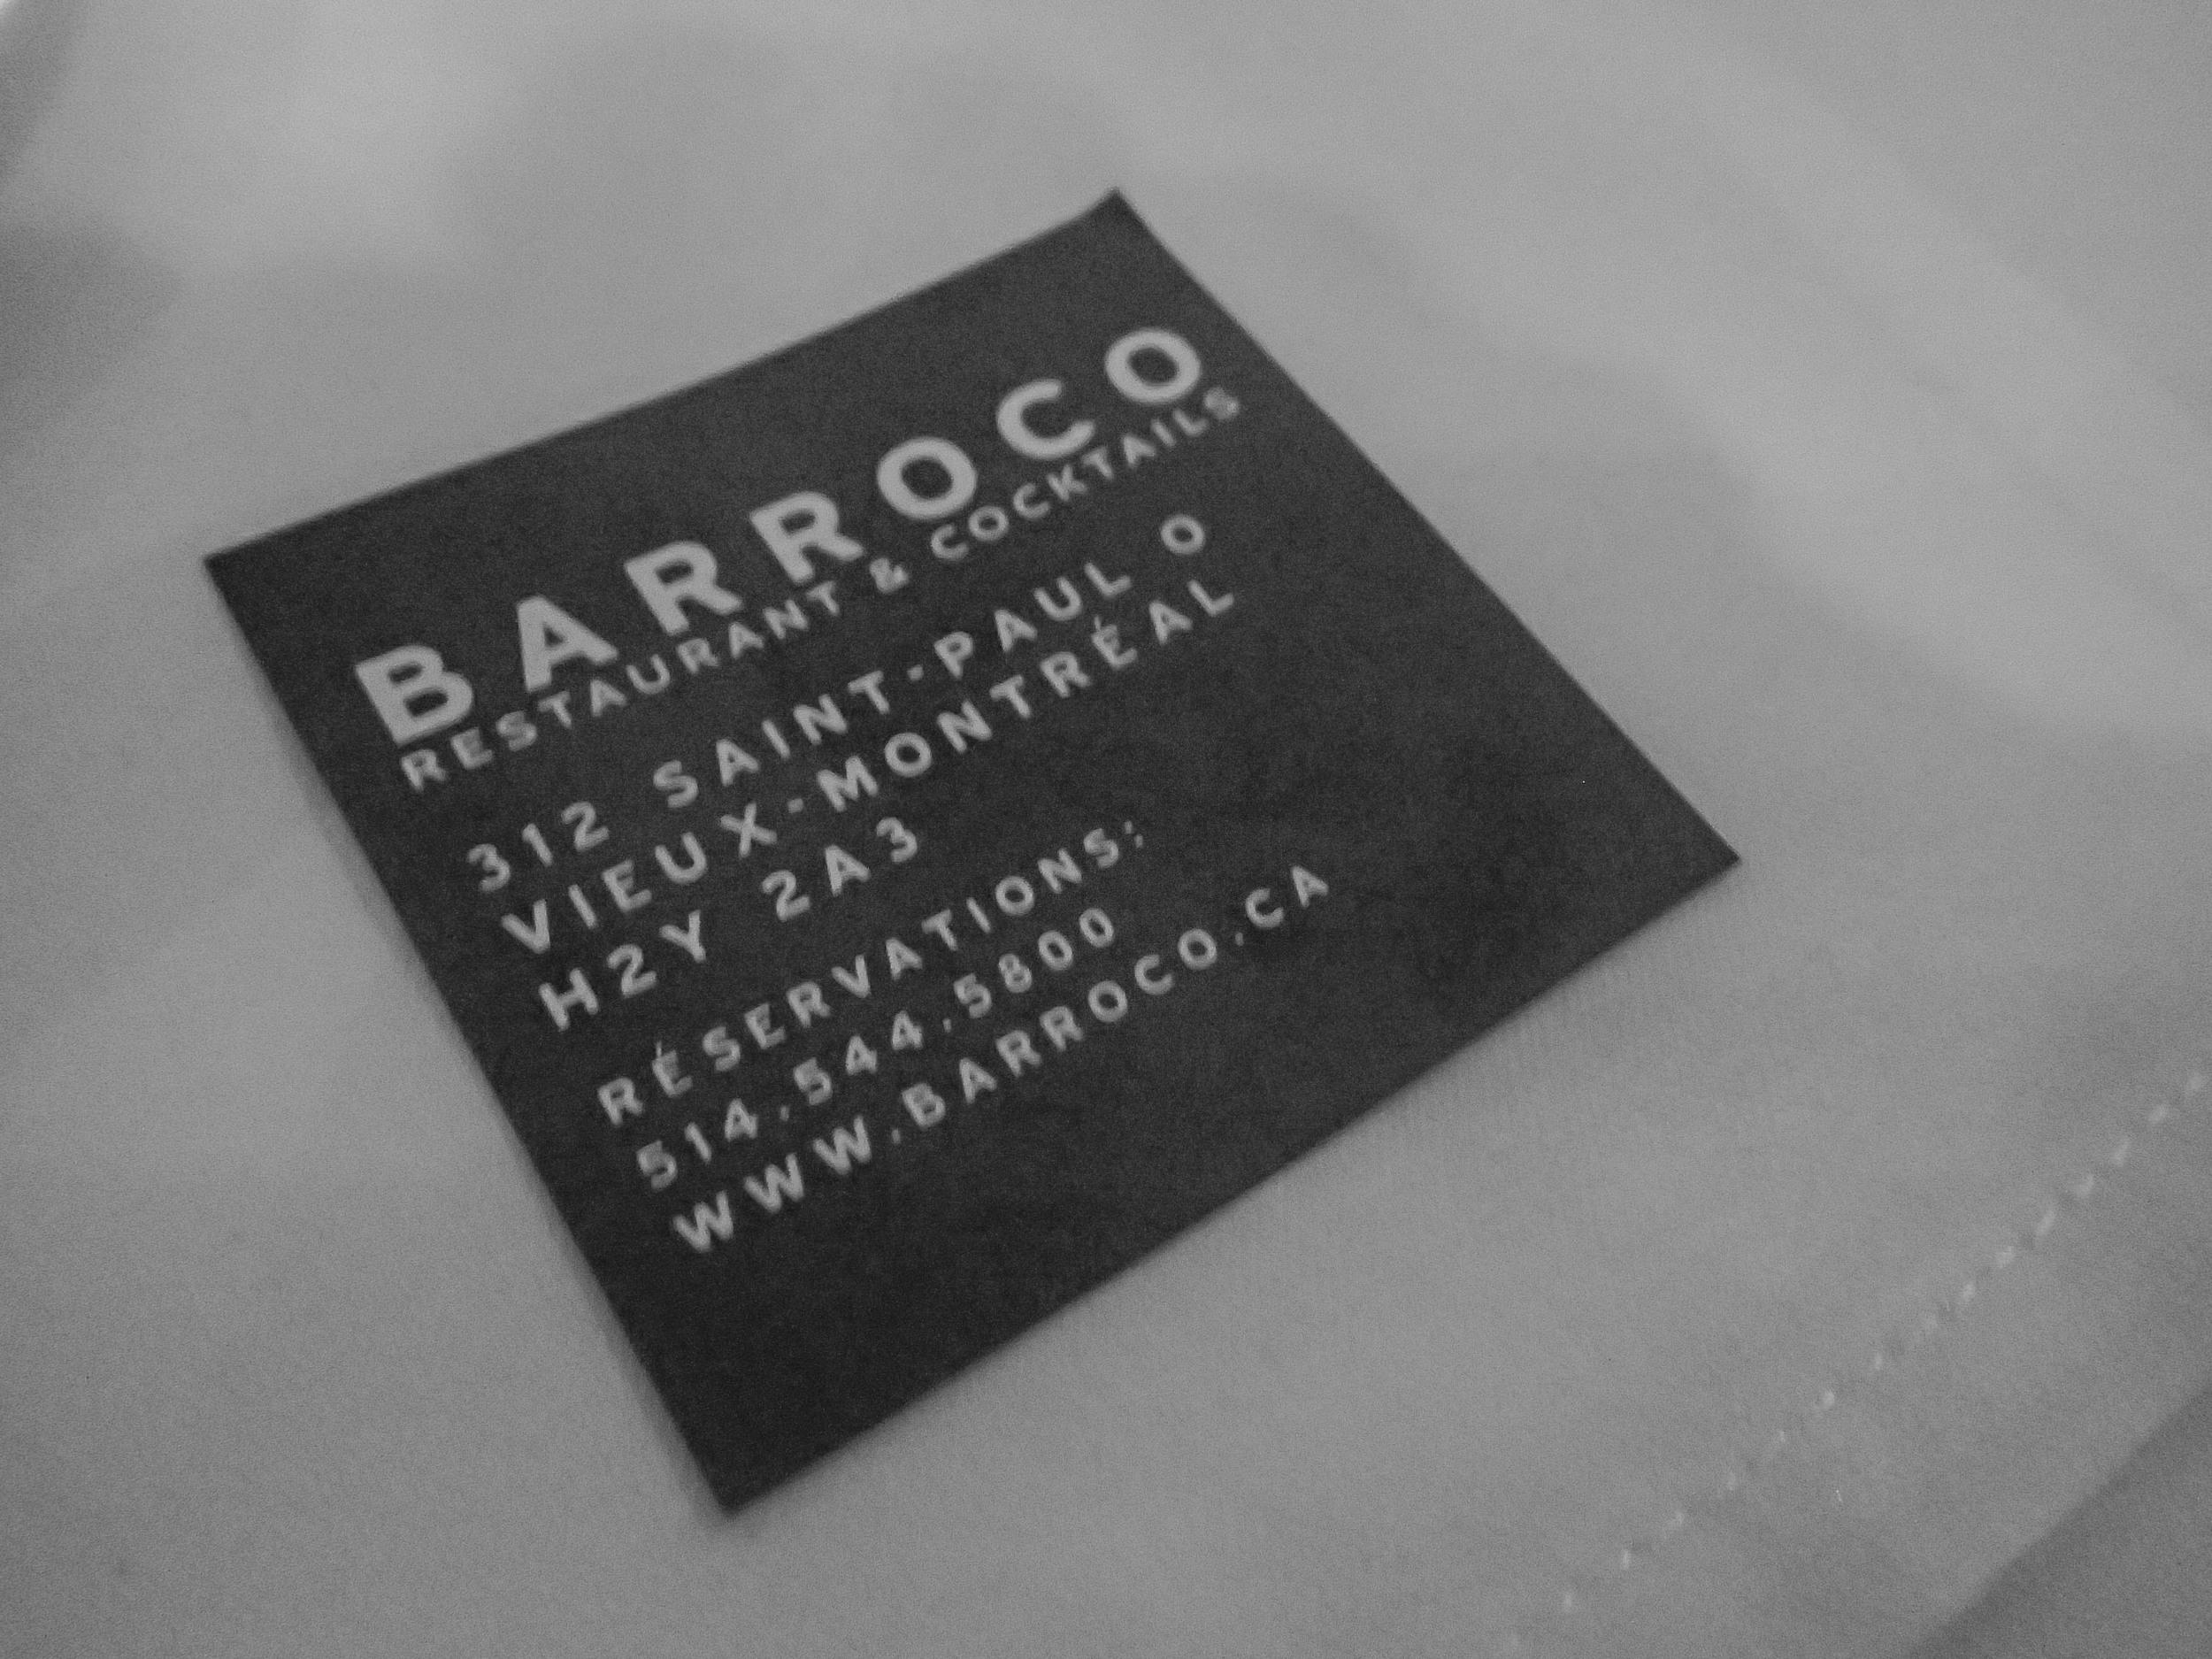 Barocco business card